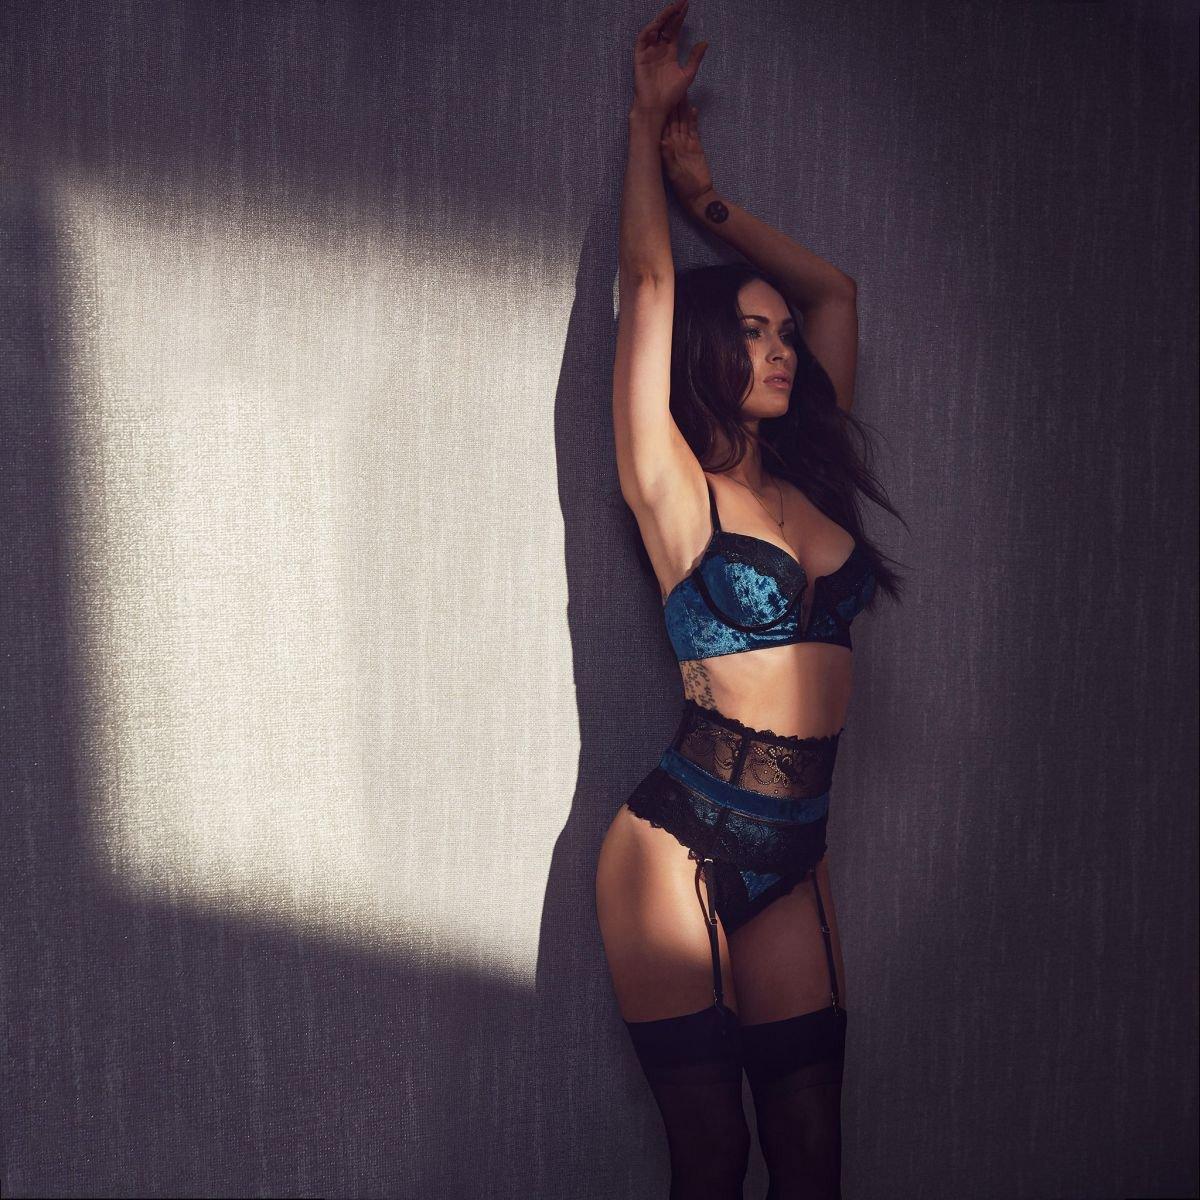 Megan Fox | Hot Celebs Home